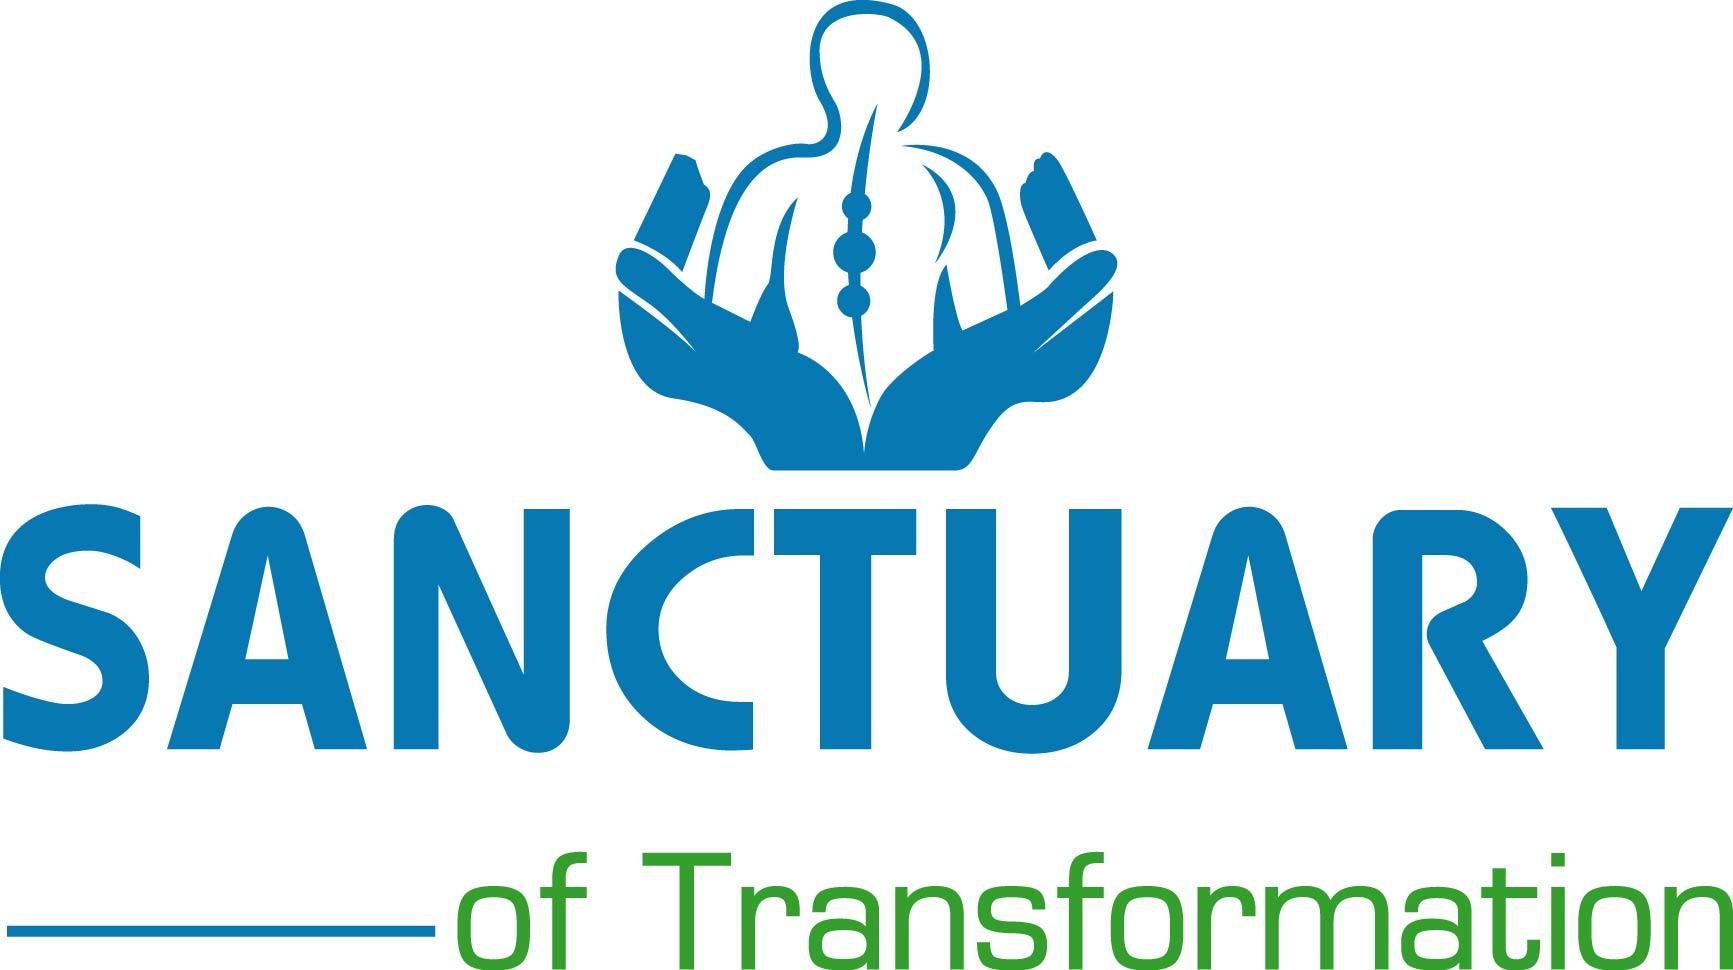 Logo Design by Private User - Entry No. 7 in the Logo Design Contest Fun Logo Design for Sanctuary of Transformation.